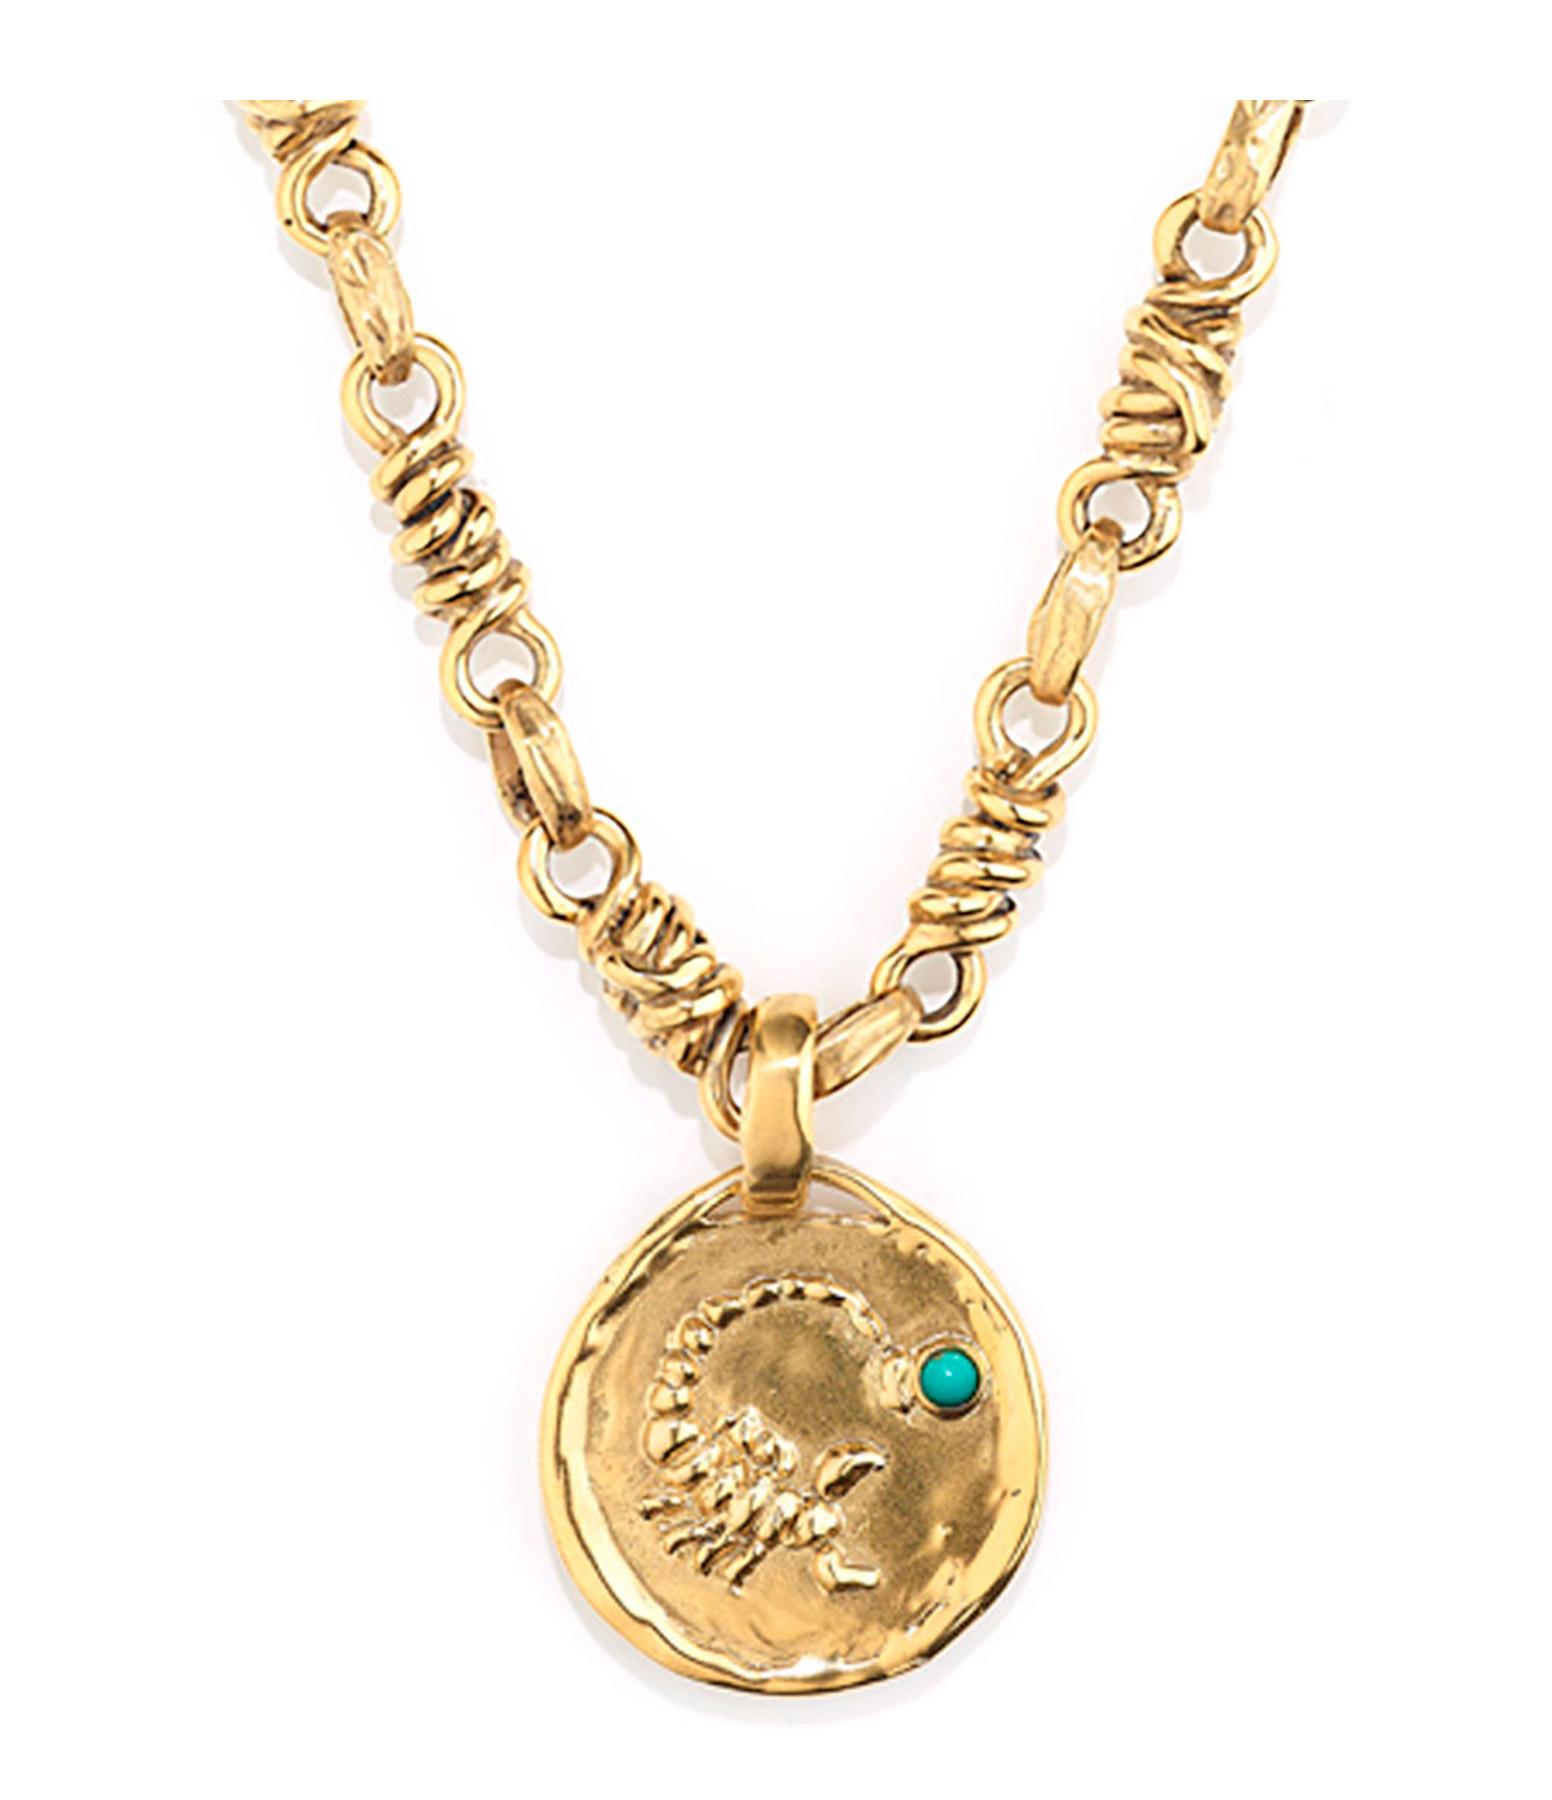 GOOSSENS - Collier Talisman Astro Scorpion Turquoise